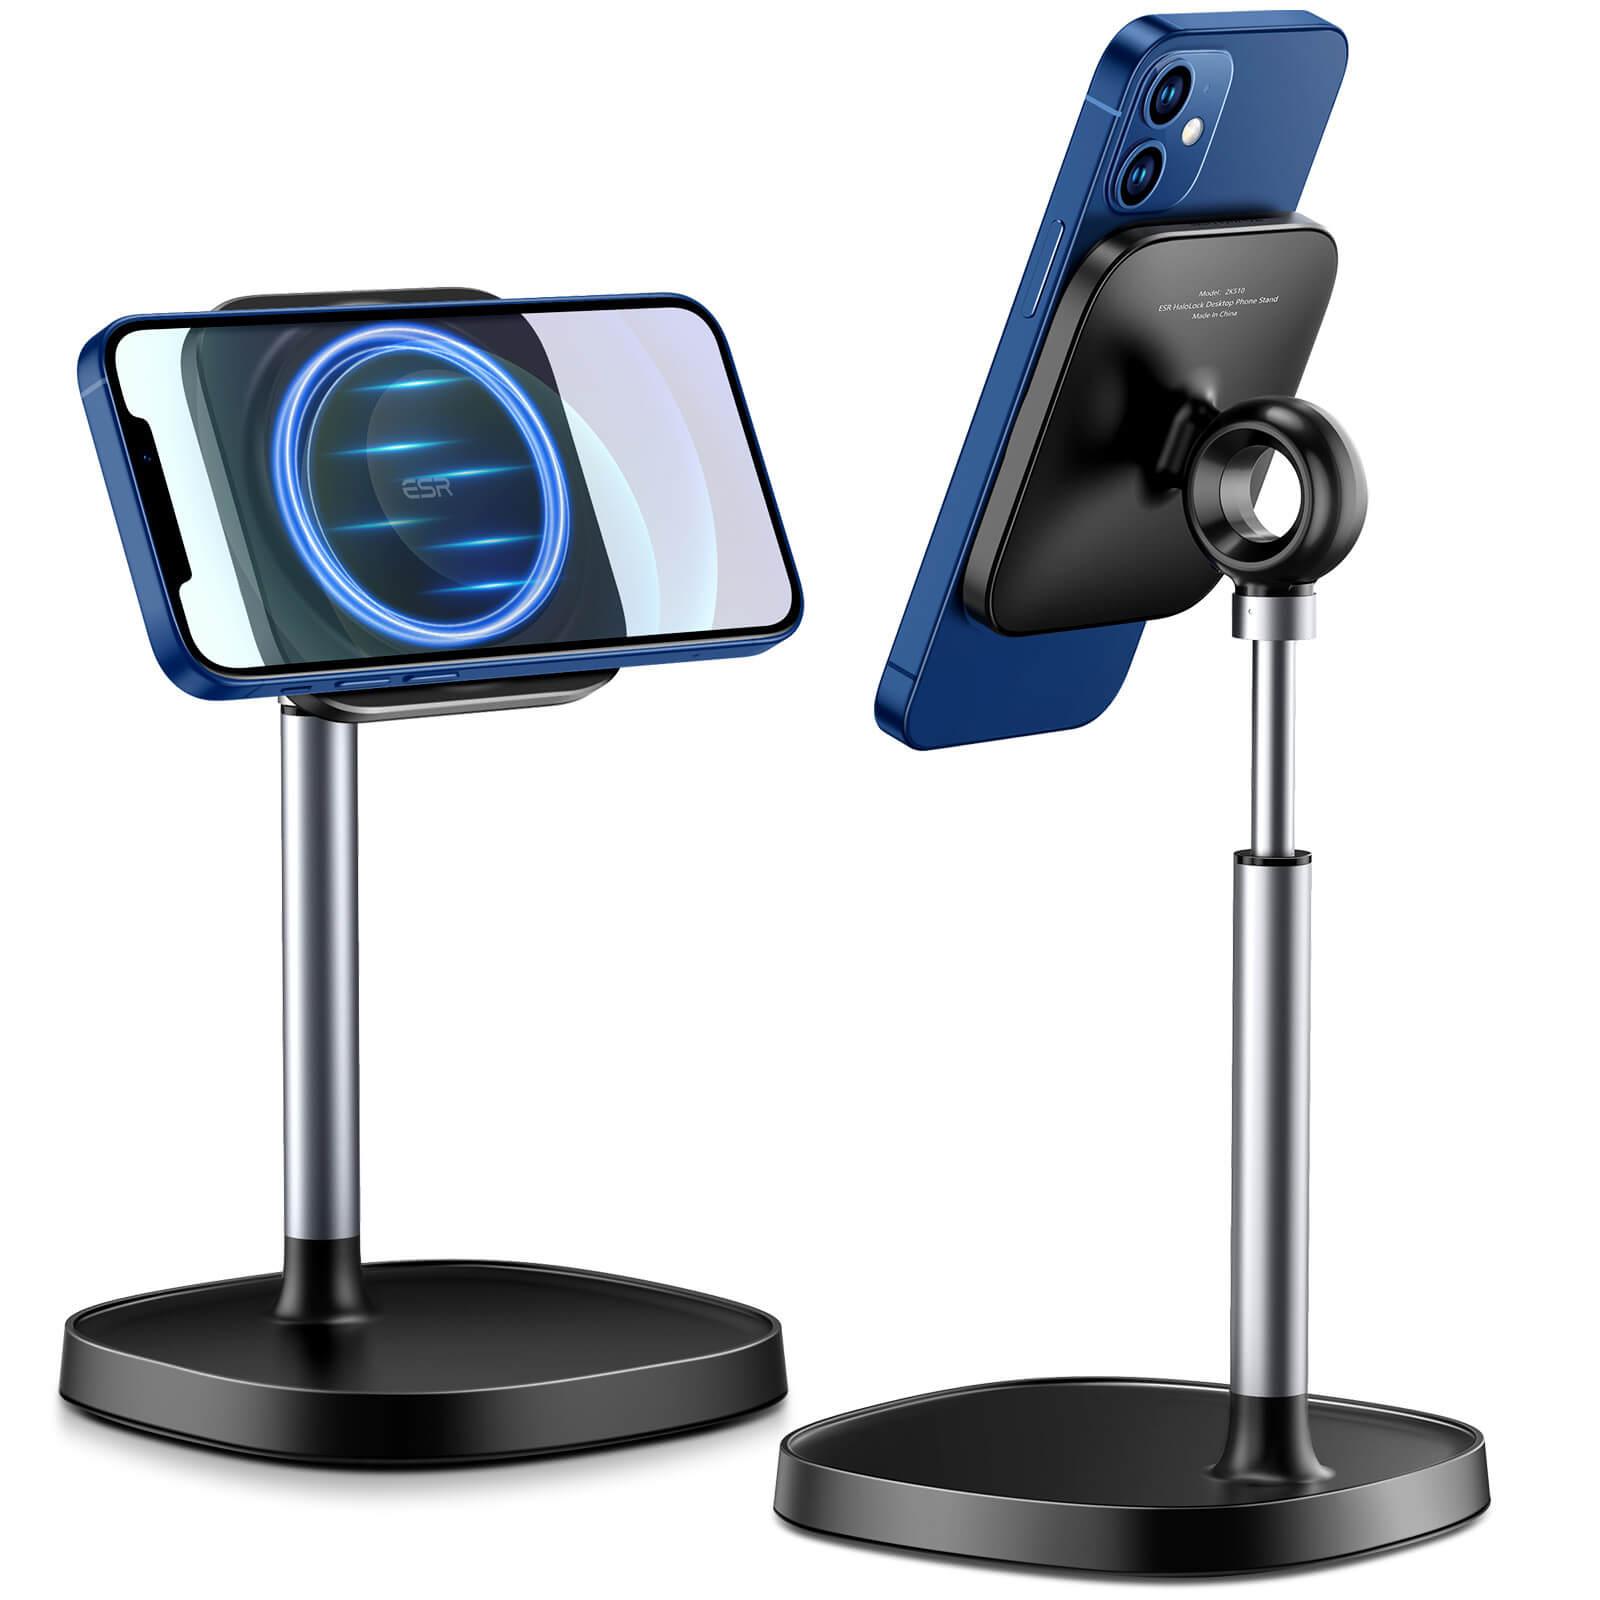 HaloLock Desktop Phone Stand 2 1